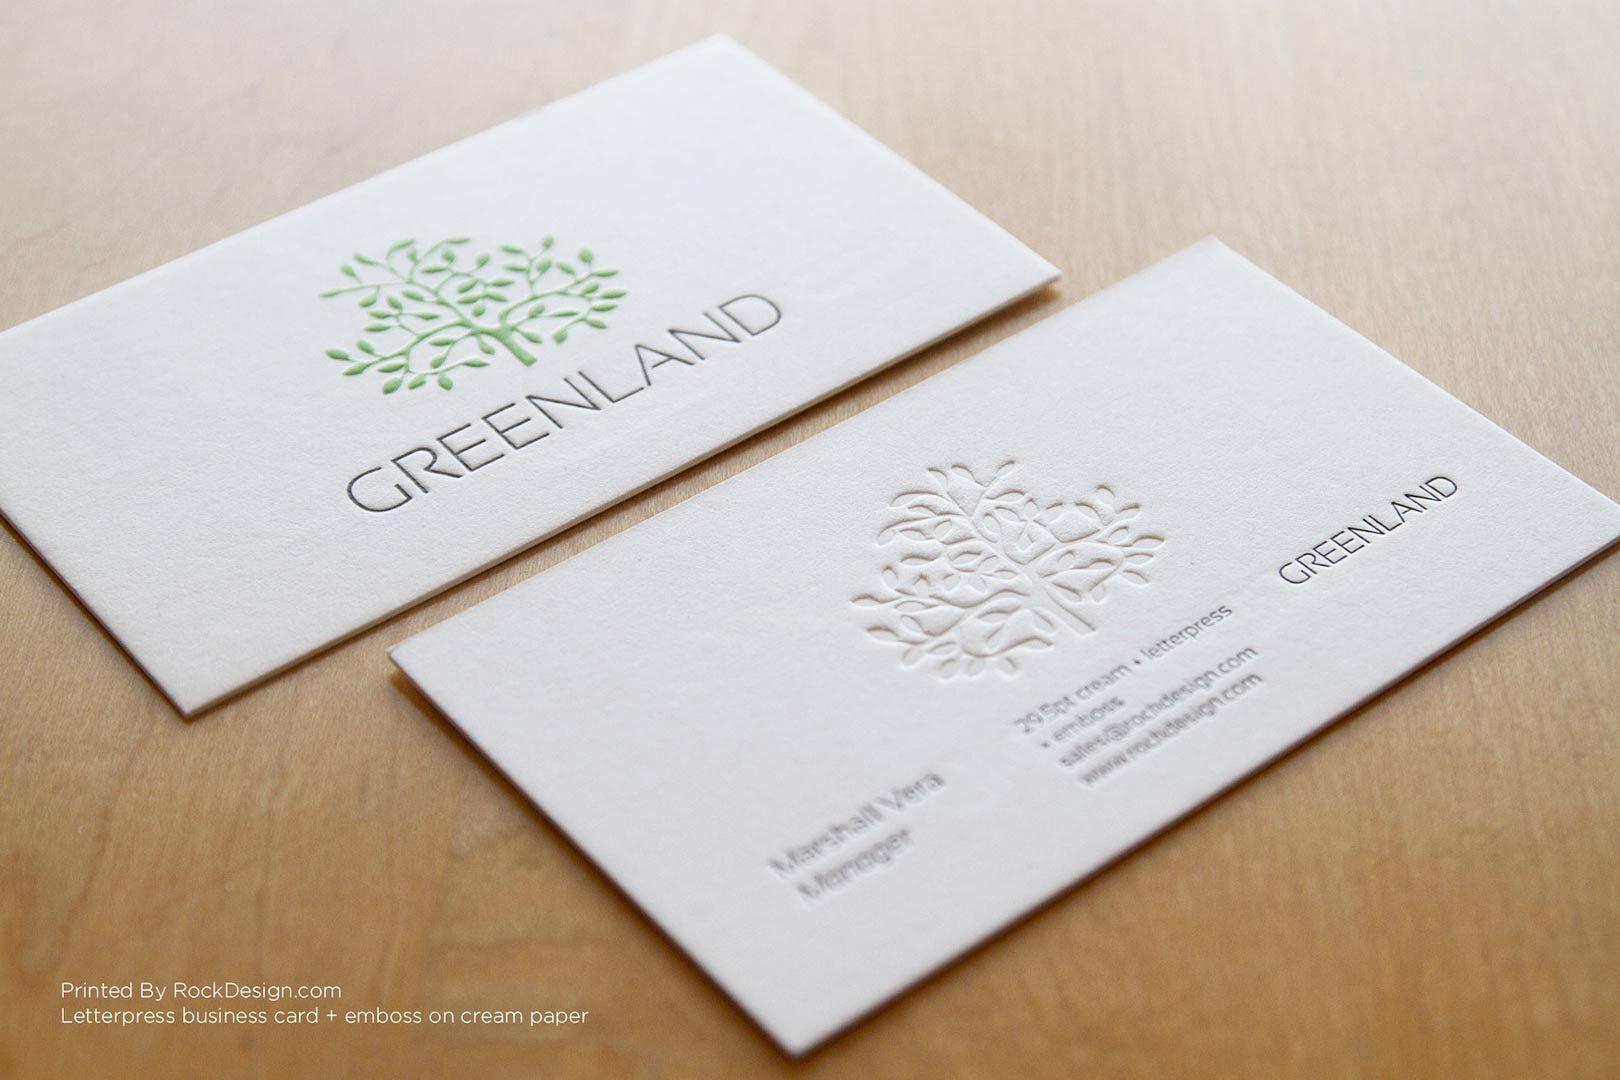 Rockdesign letterpress business cards httpwww rockdesign letterpress business cards httprockdesign letterpress business cards business cards pinterest letterpresses business reheart Choice Image